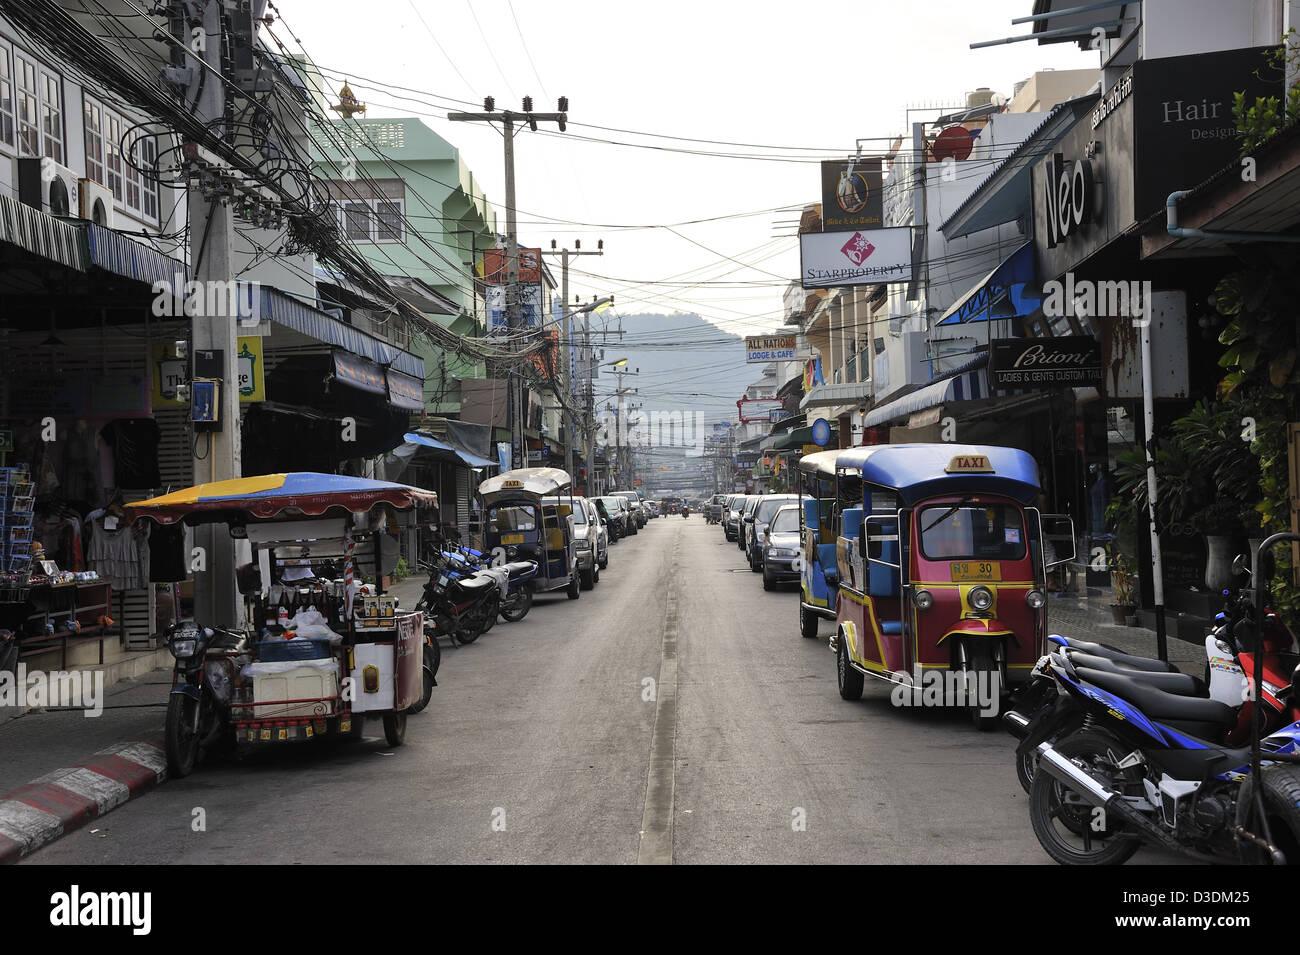 Sreet in Hua Hin City, Thailand - Stock Image